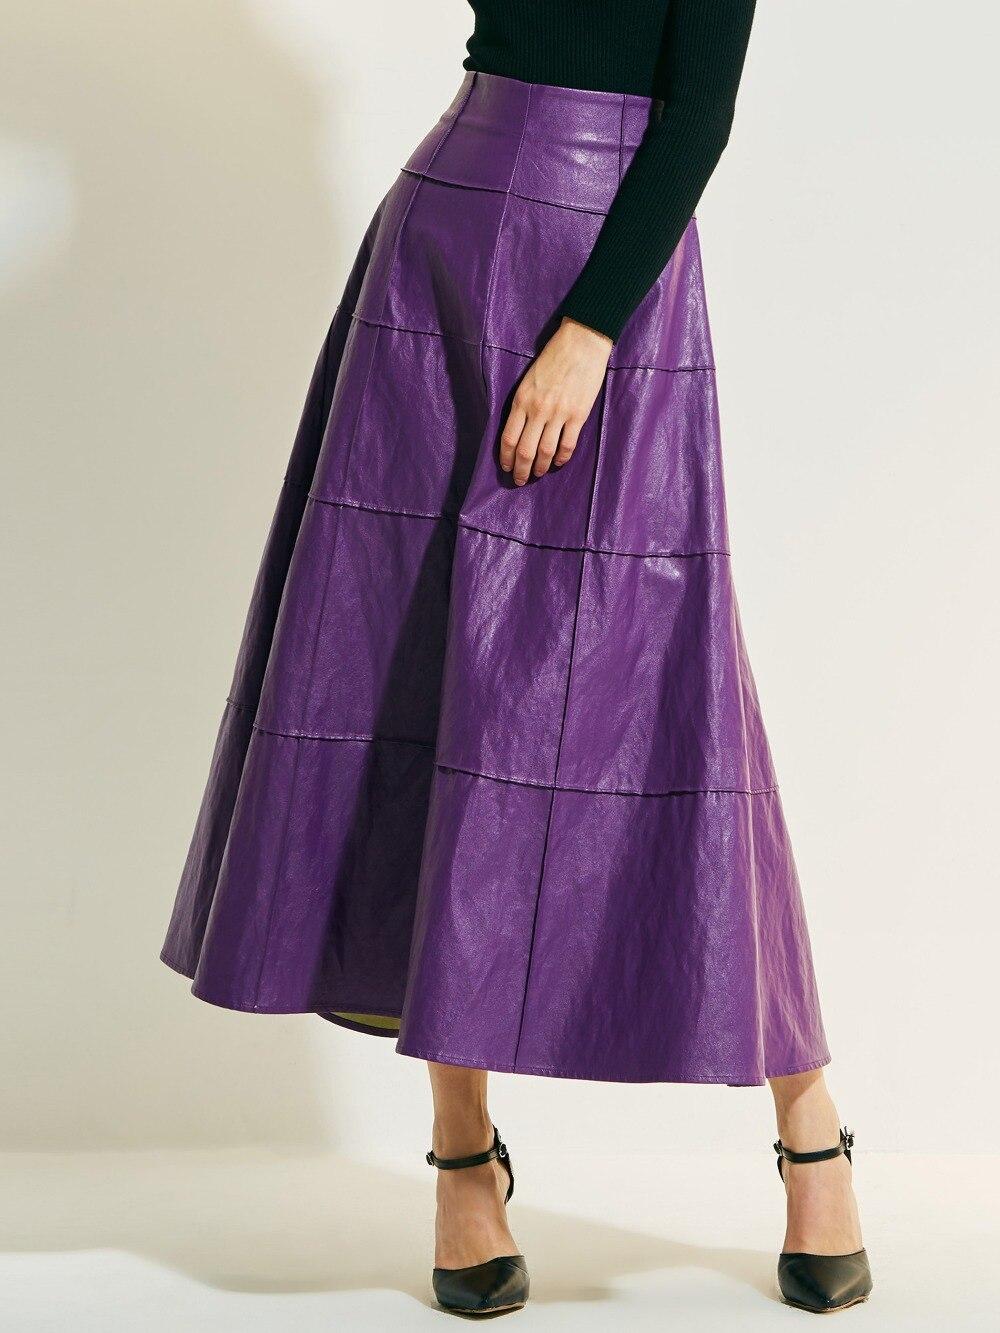 2018 High Waist Pleat Elegant Skirt red purple palid Solid Color Long Skirts Women Faldas Saia A line Plus Size Ladies Jupe